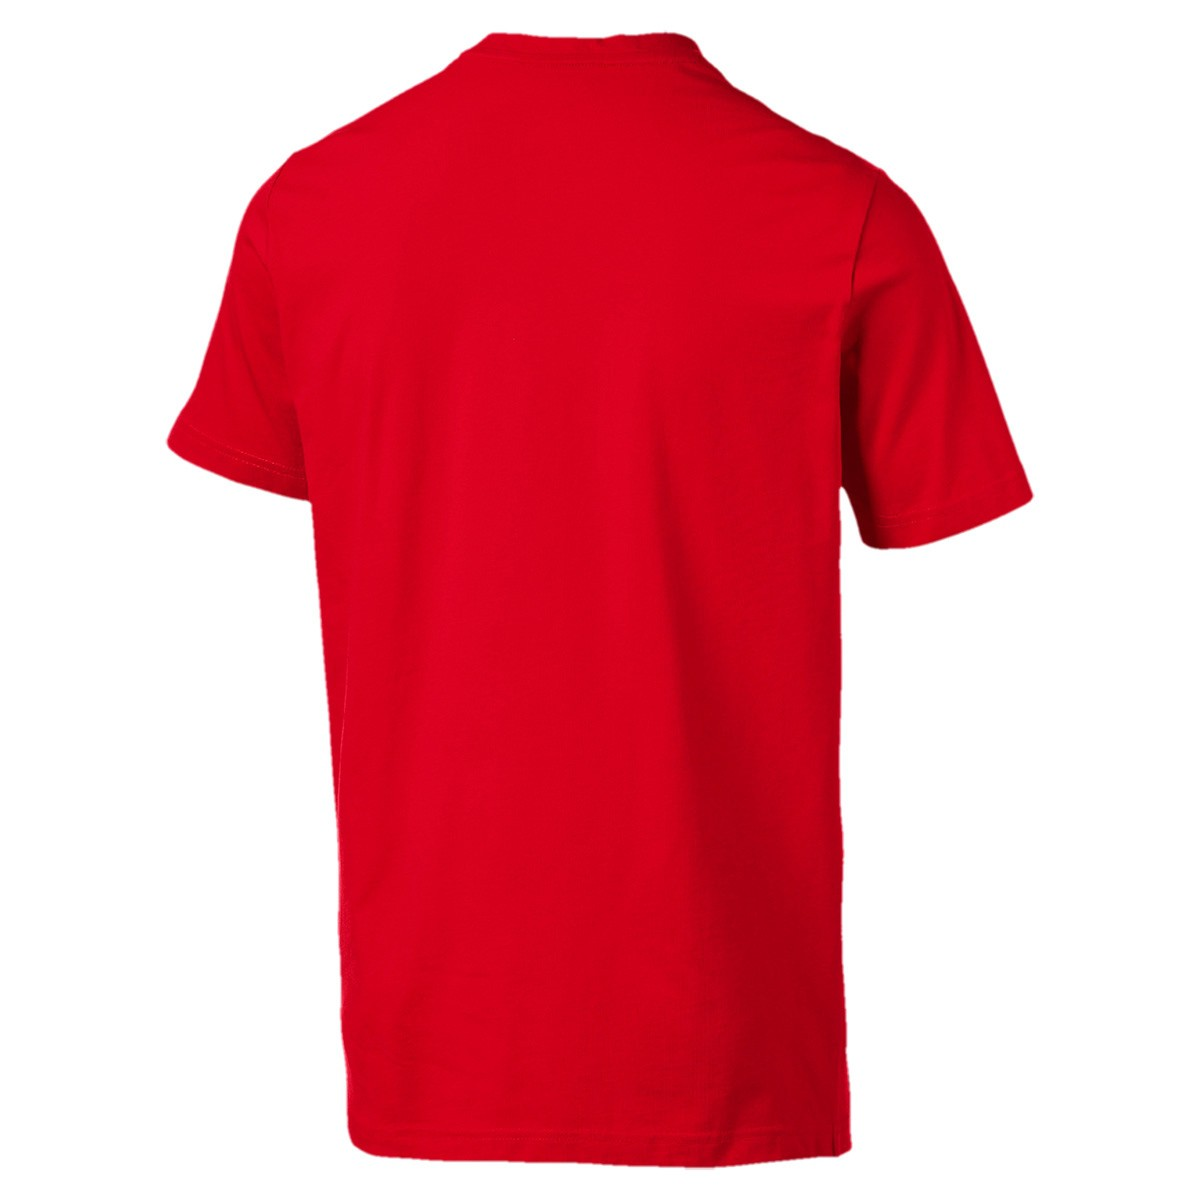 Camiseta Ferrari Puma Big Shield Tee - Vermelha - Masculina